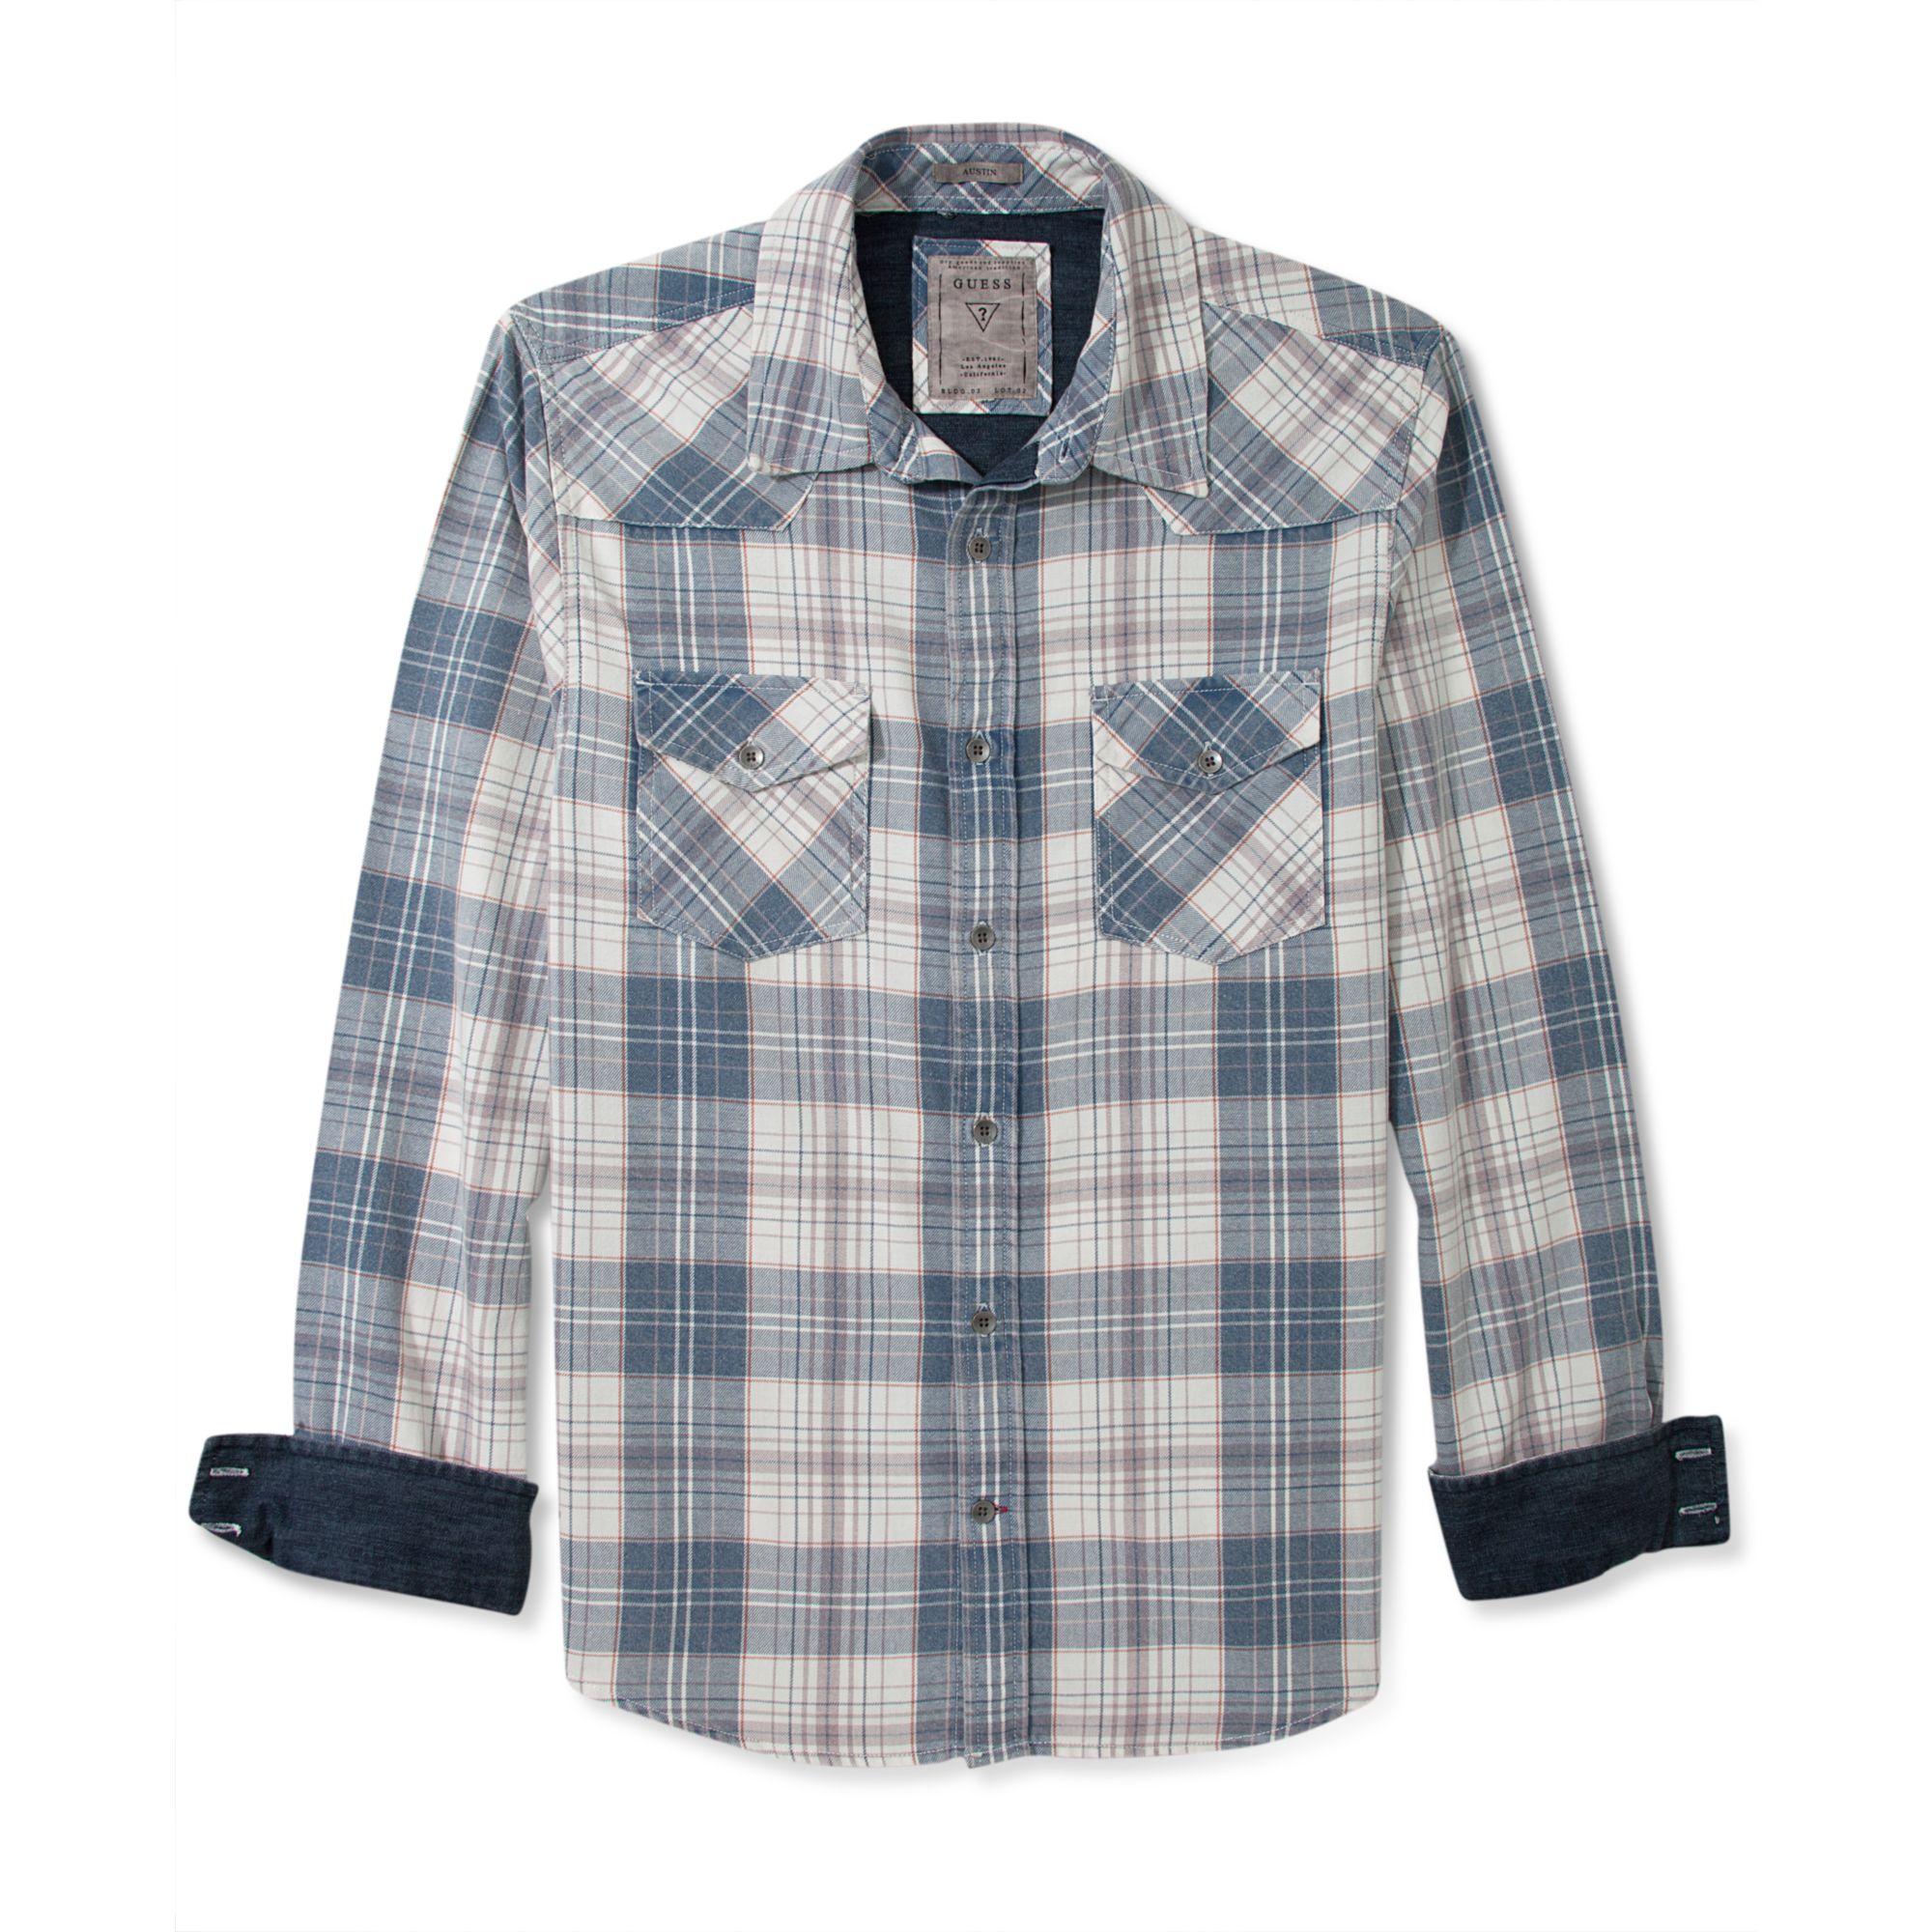 Guess Long Sleeve Shirt Tigerprint Plaid In Blue For Men